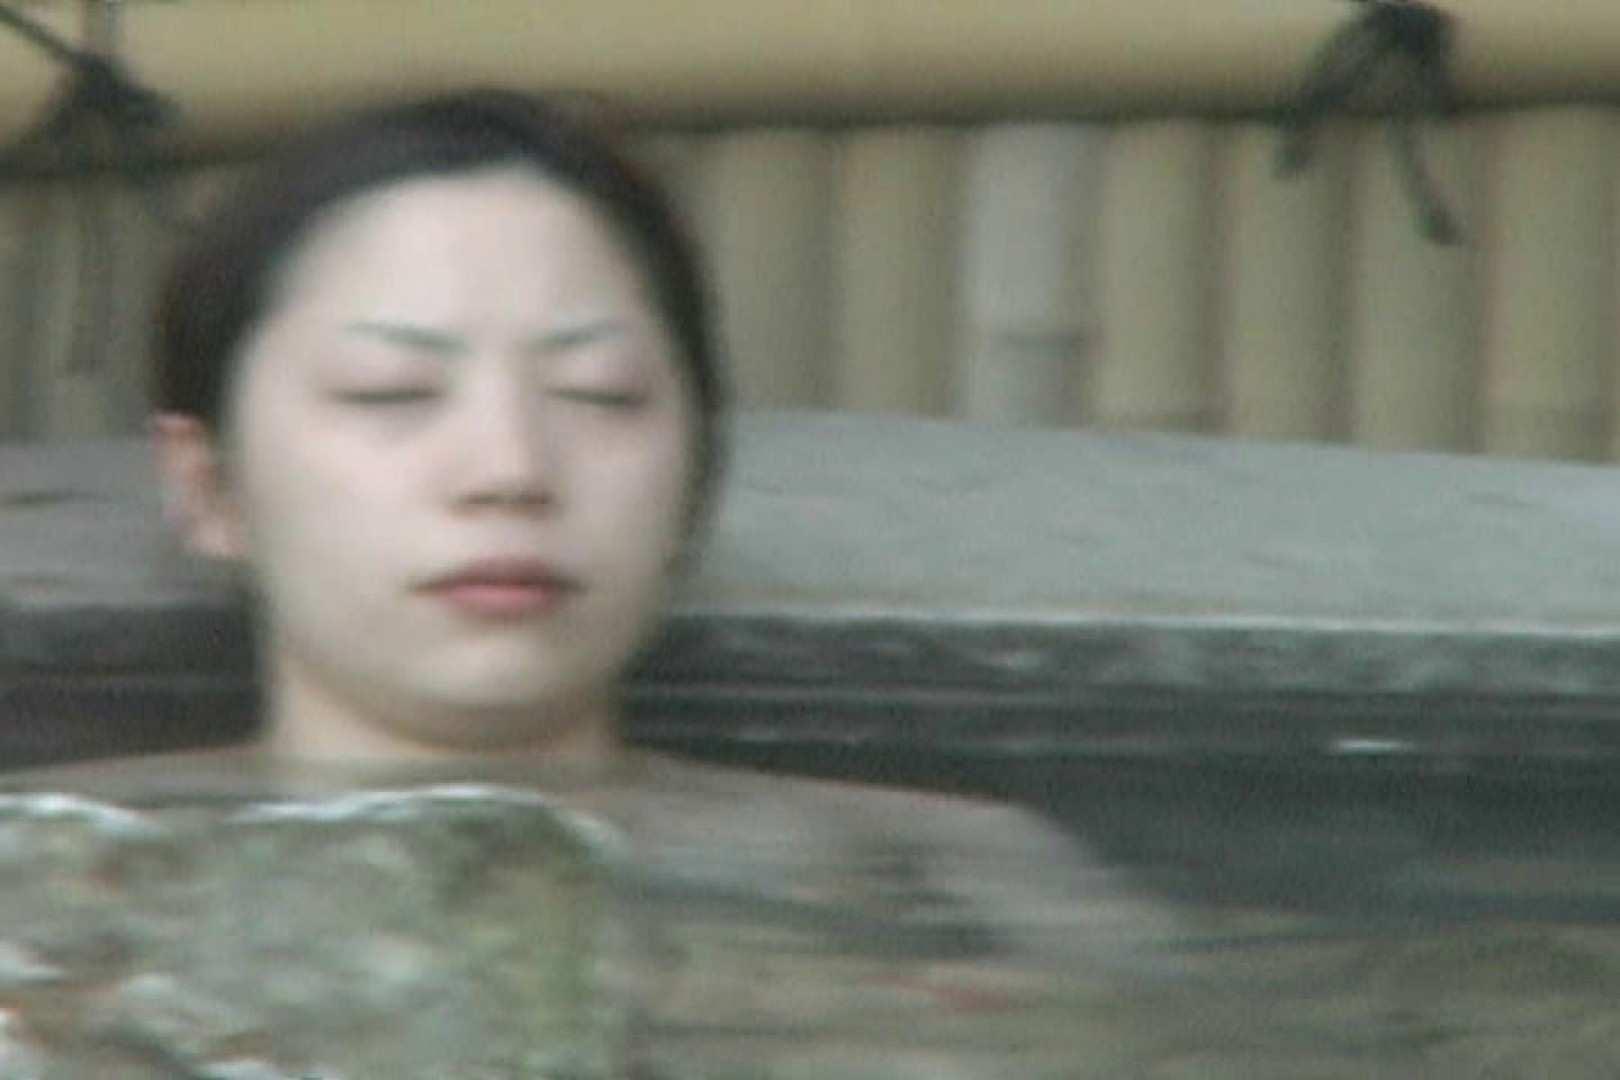 Aquaな露天風呂Vol.596 露天 覗きおまんこ画像 77画像 38